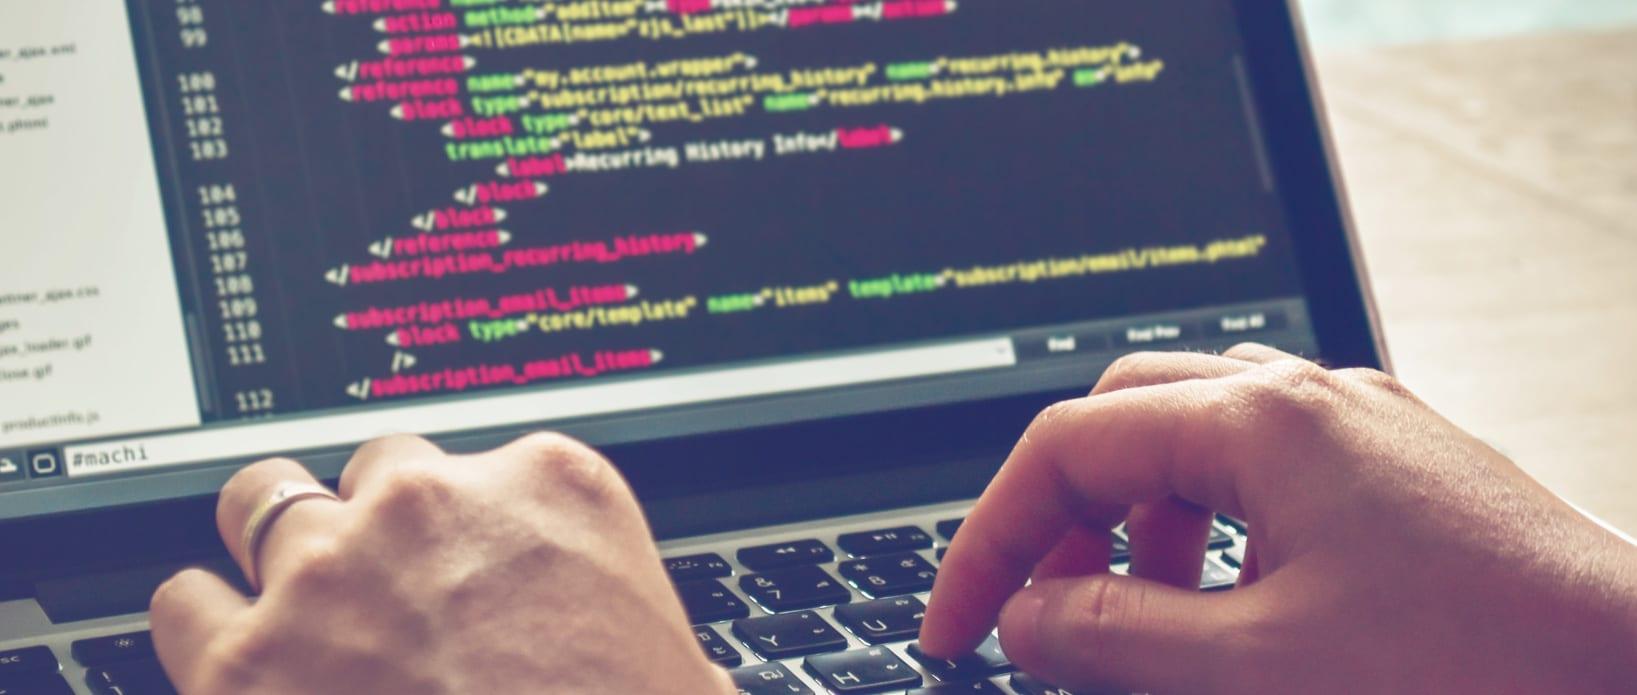 How to Setup a Local WordPress Development Environment - Pressable